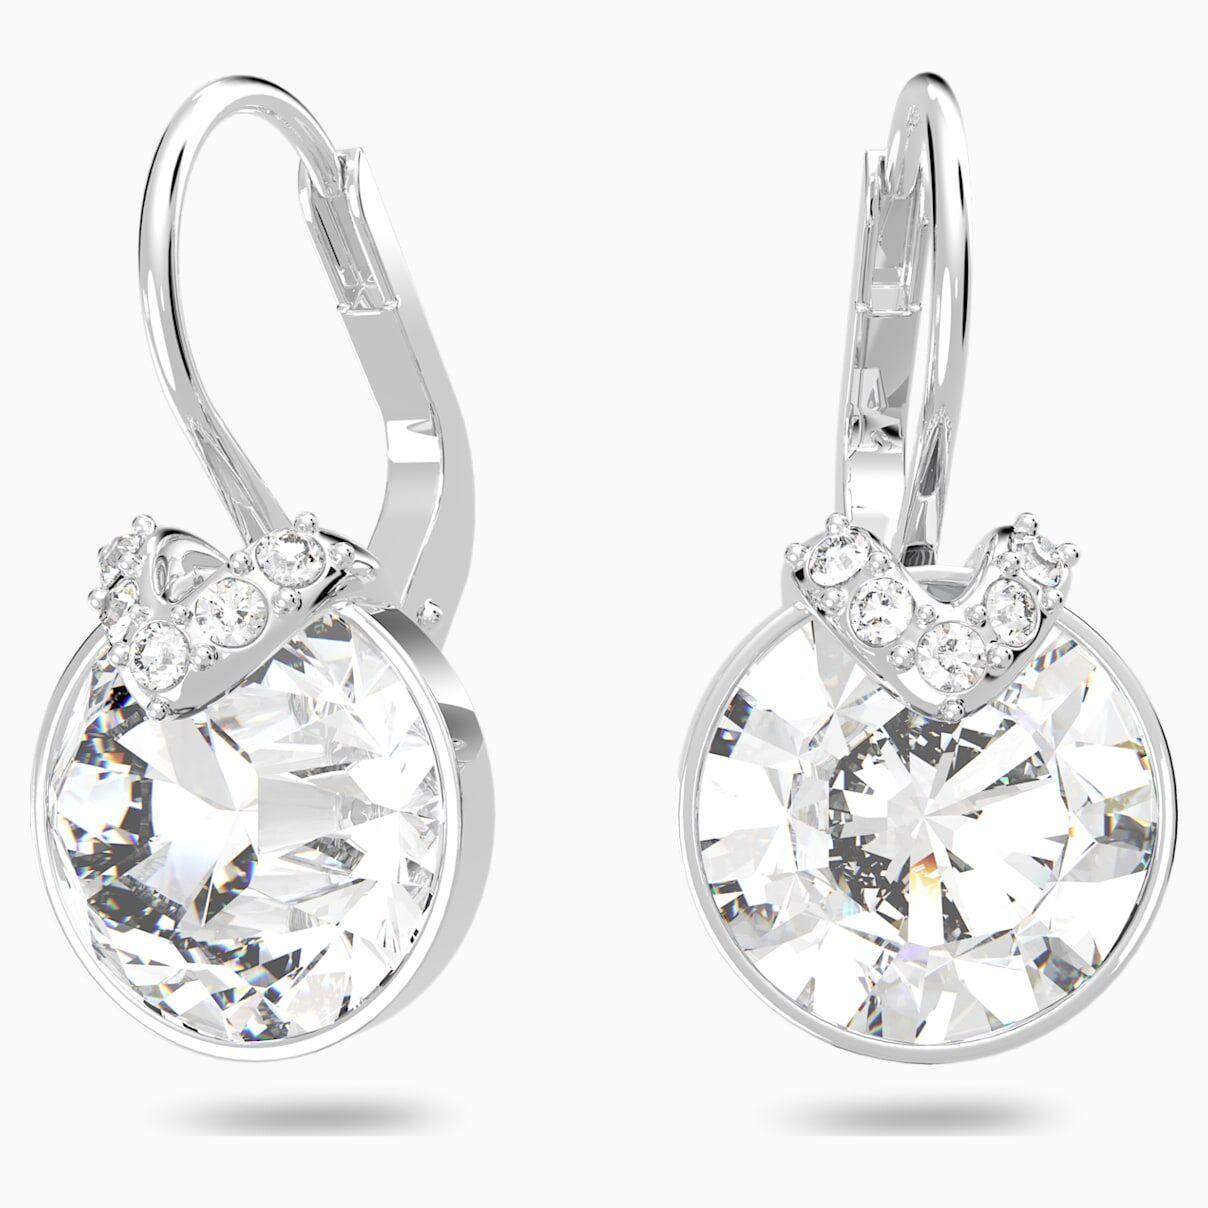 Swarovski Bella V Pierced Earrings, White, Rhodium plated